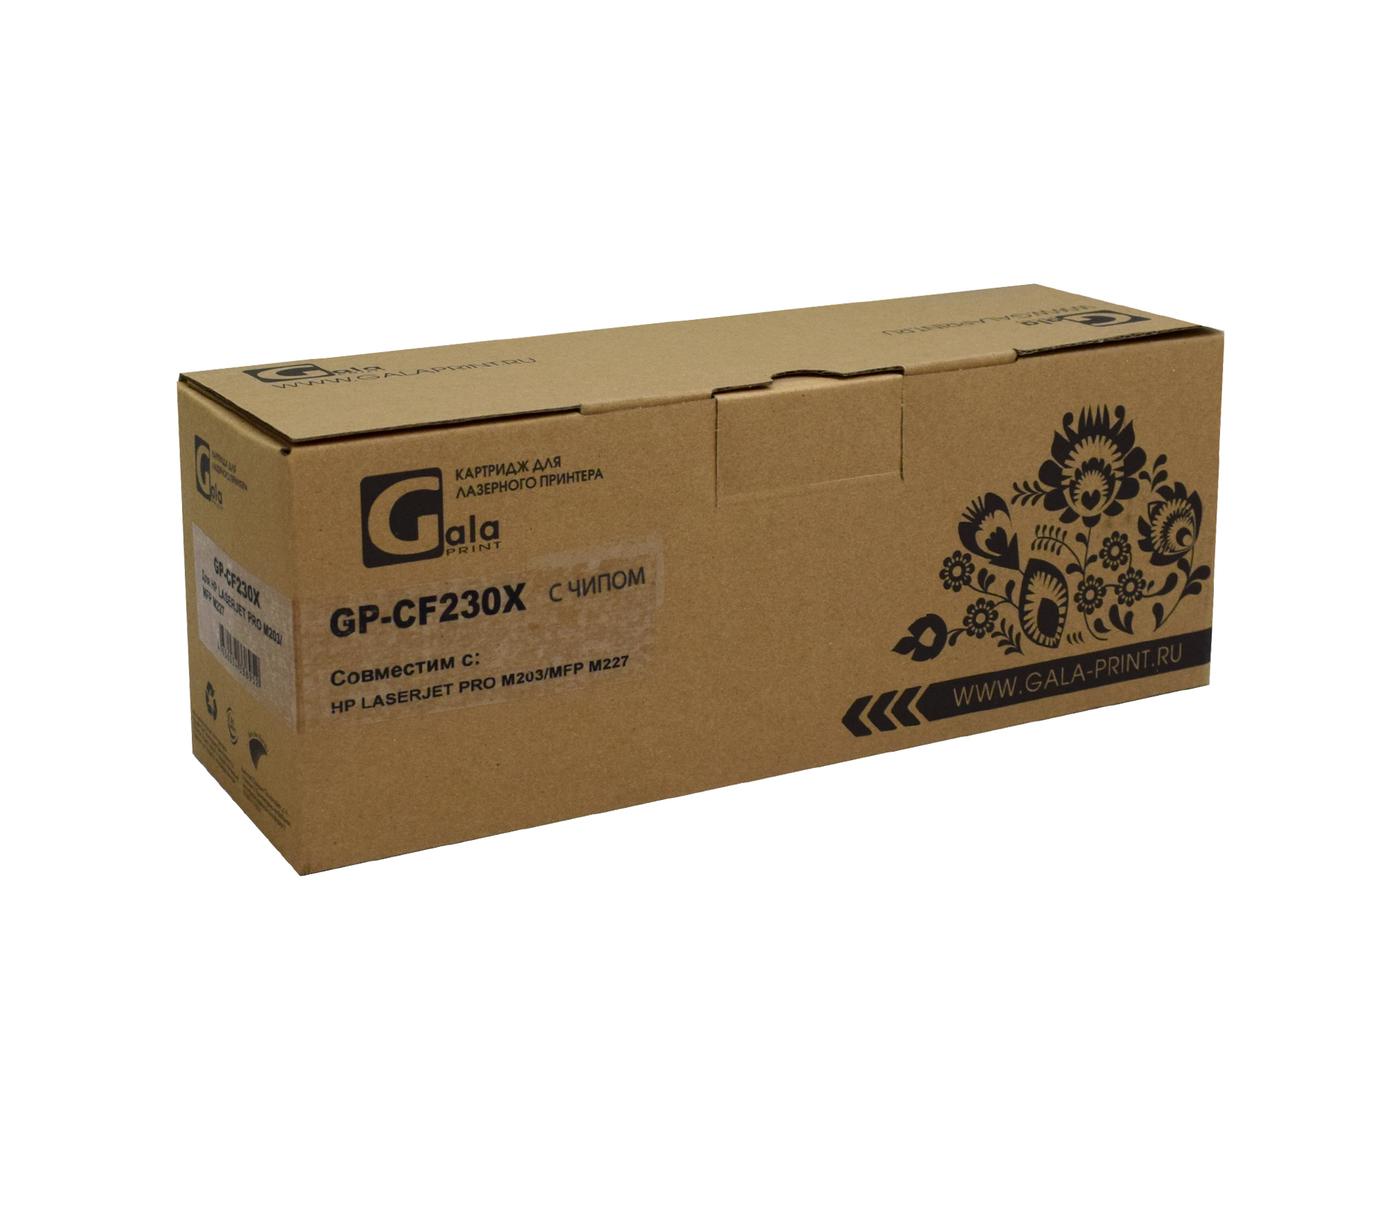 Картридж GalaPrint GP-CF230X, черный